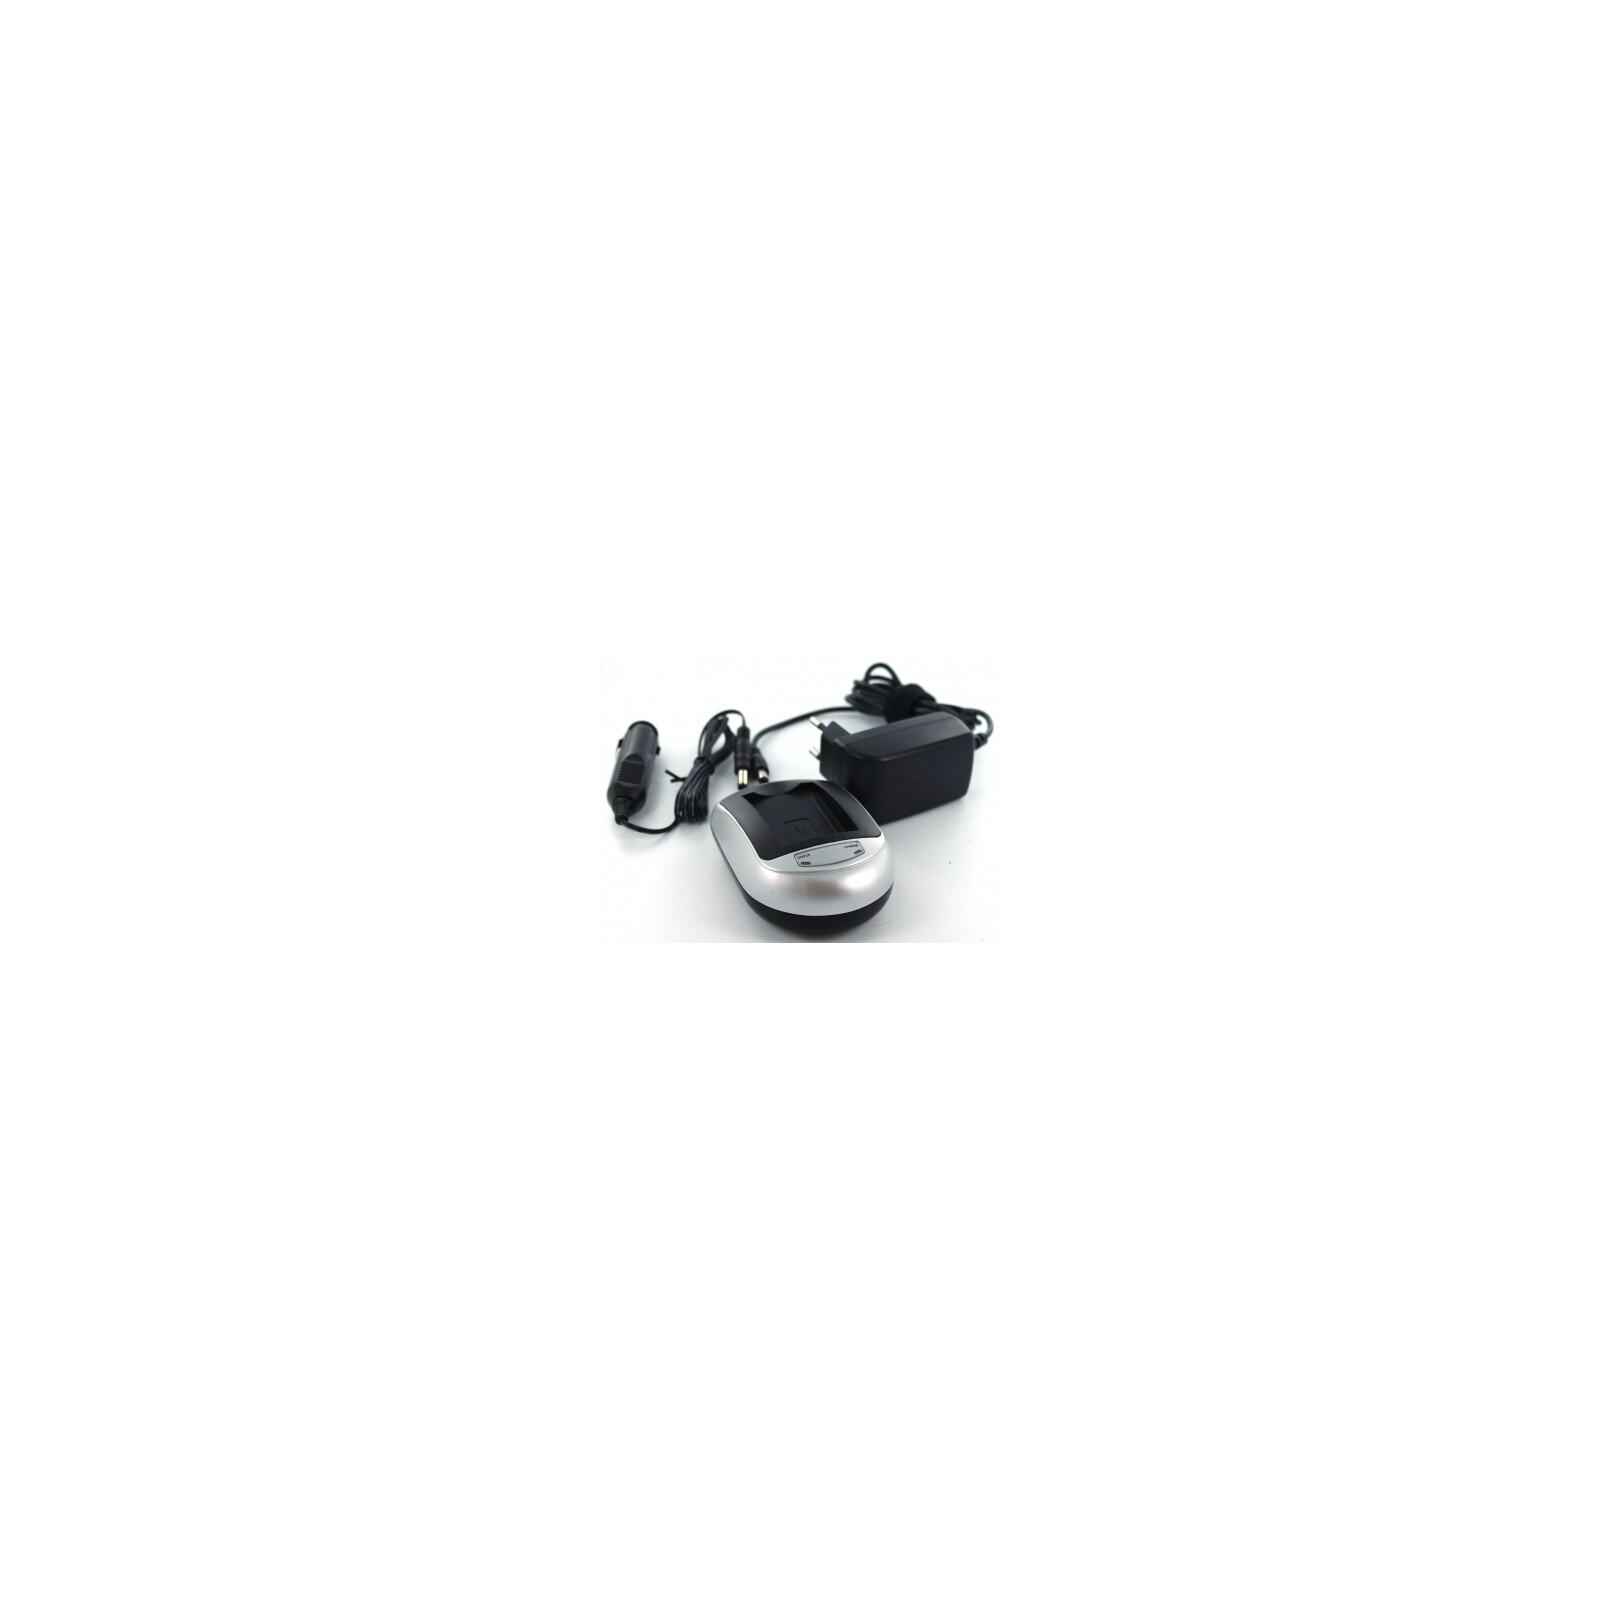 AGI 11728 Ladegerät Nikon Coolpix P520